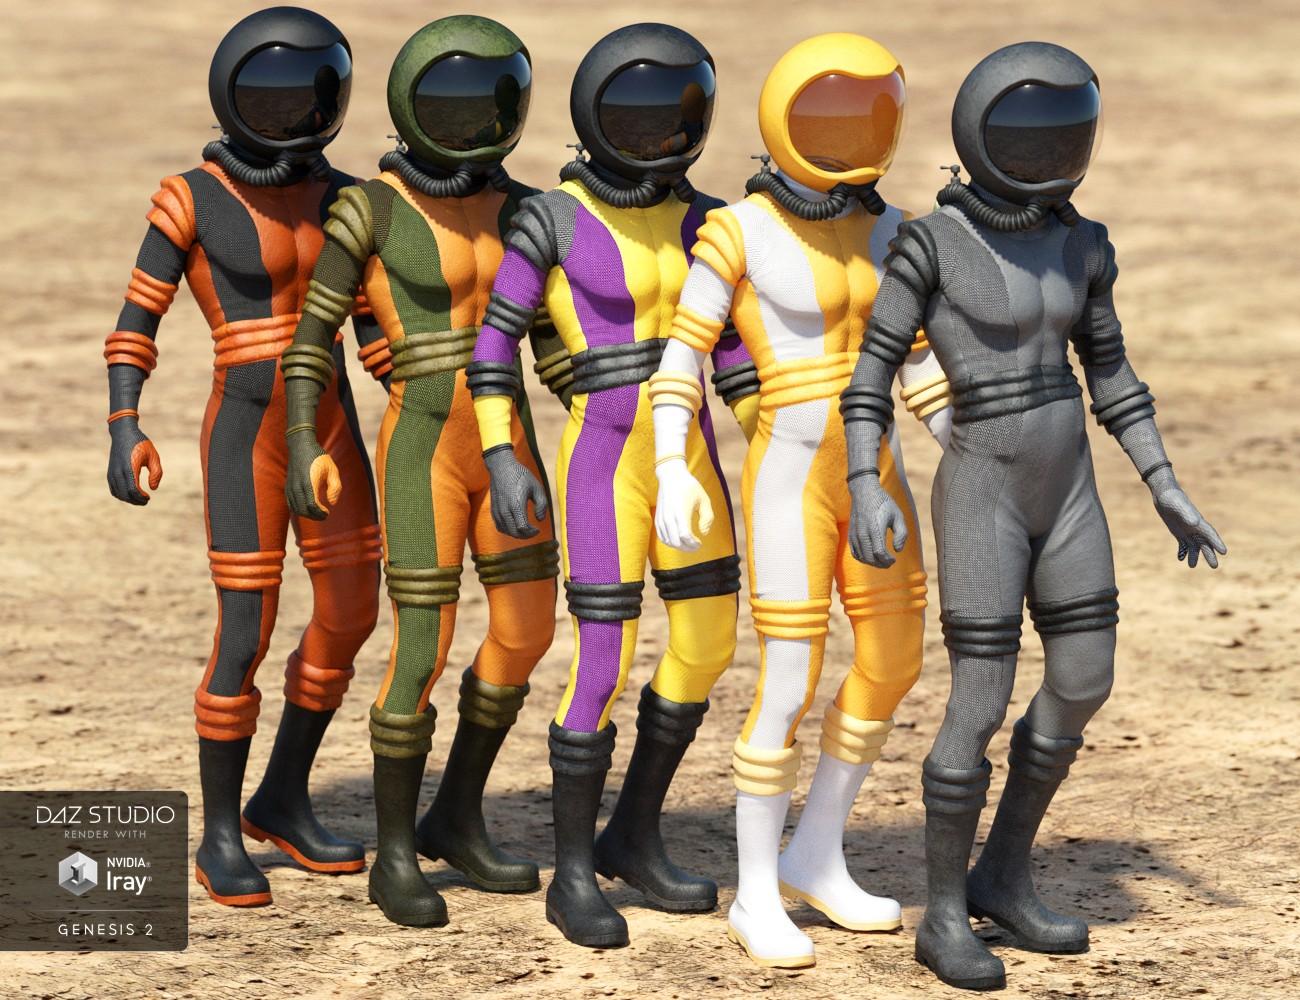 retro space suits - photo #22